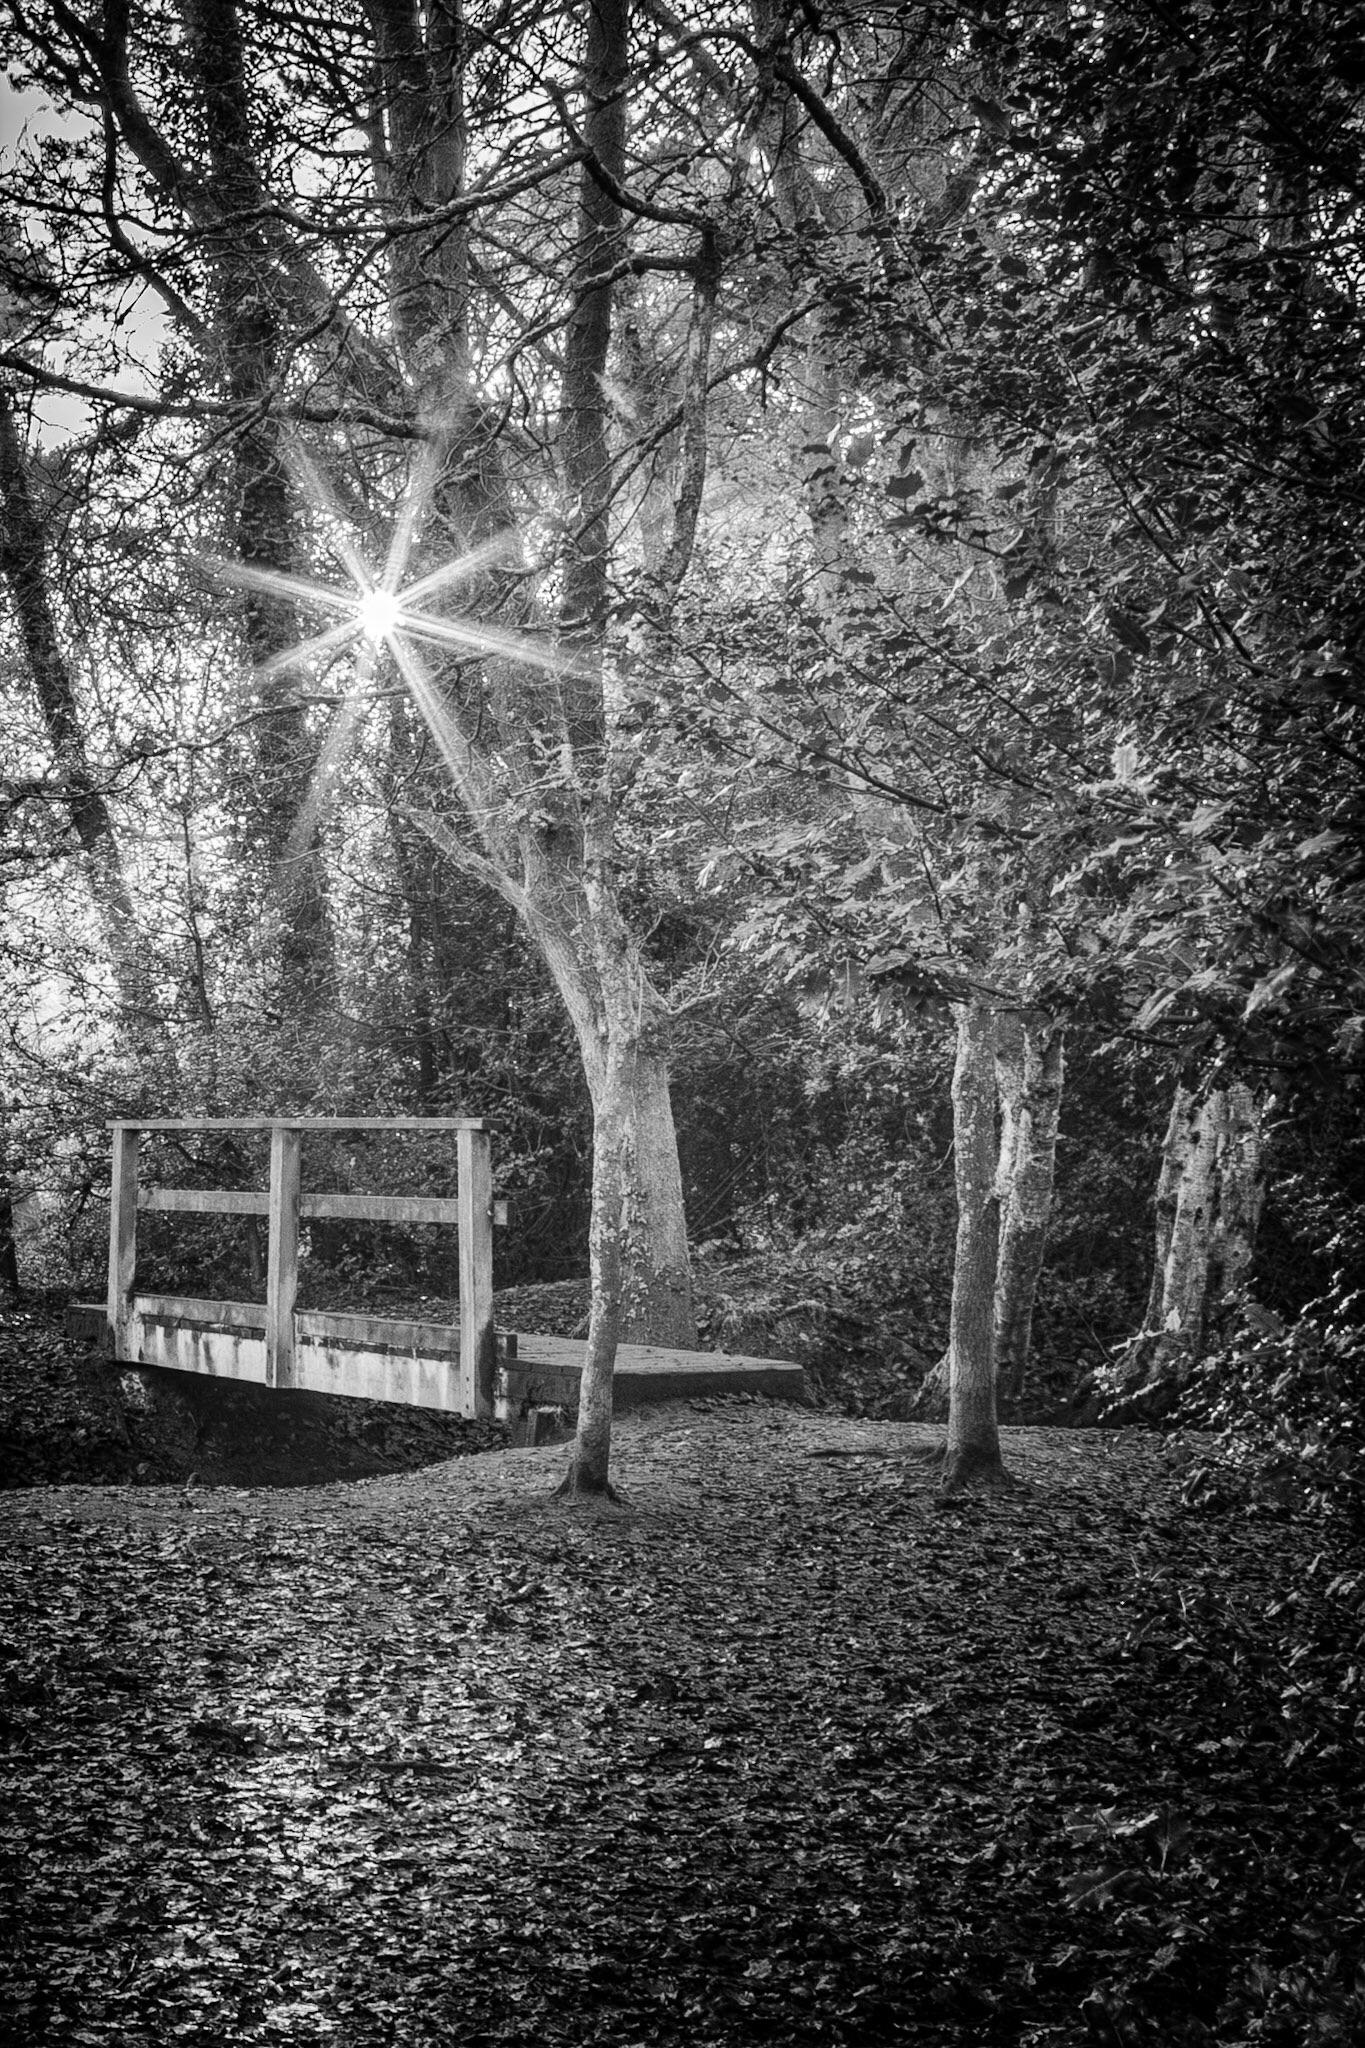 Footbridge in the woods, Poole, Dorset.